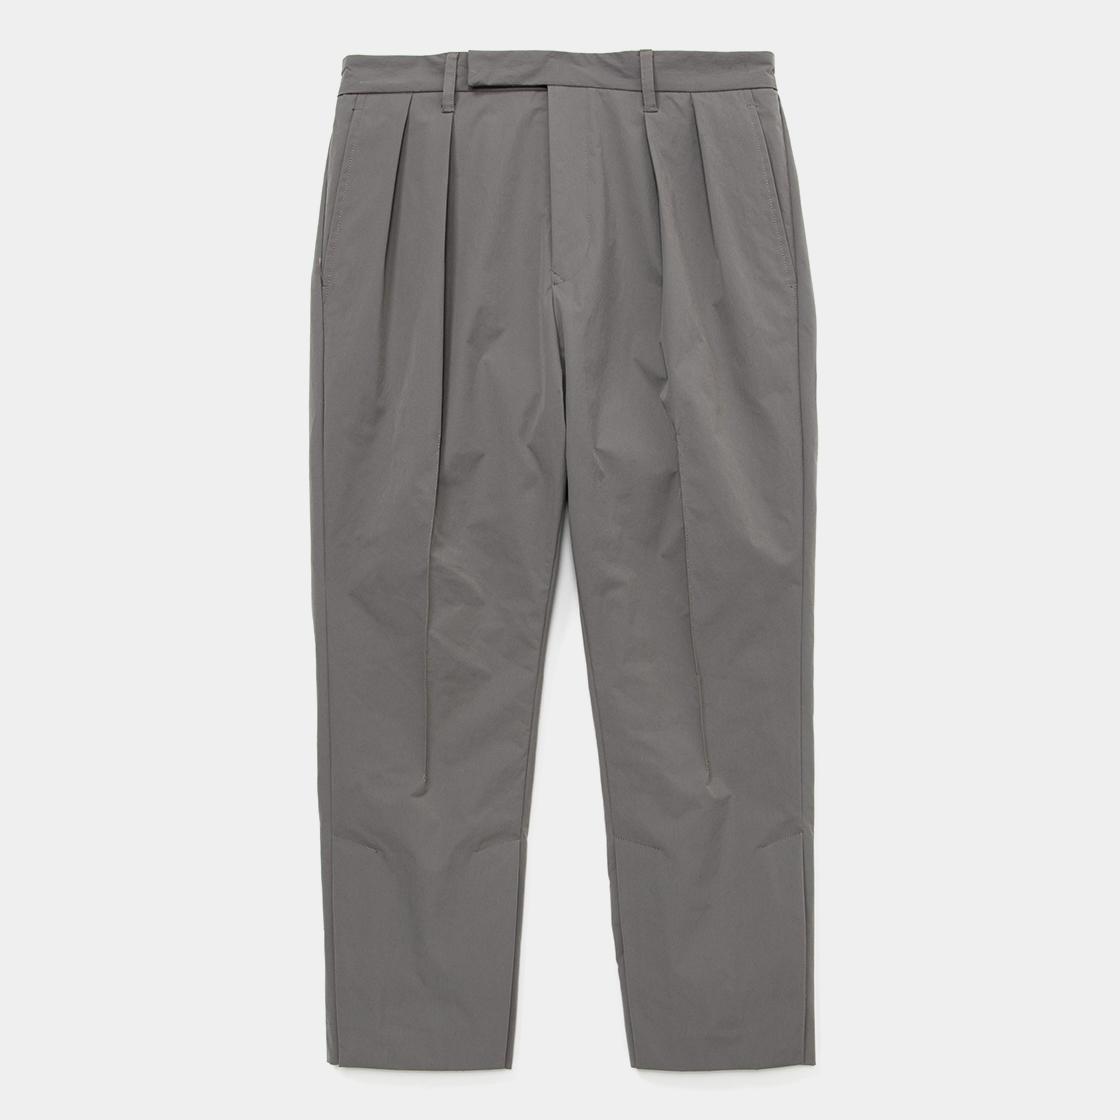 Crisp Blur Trouser / Grey